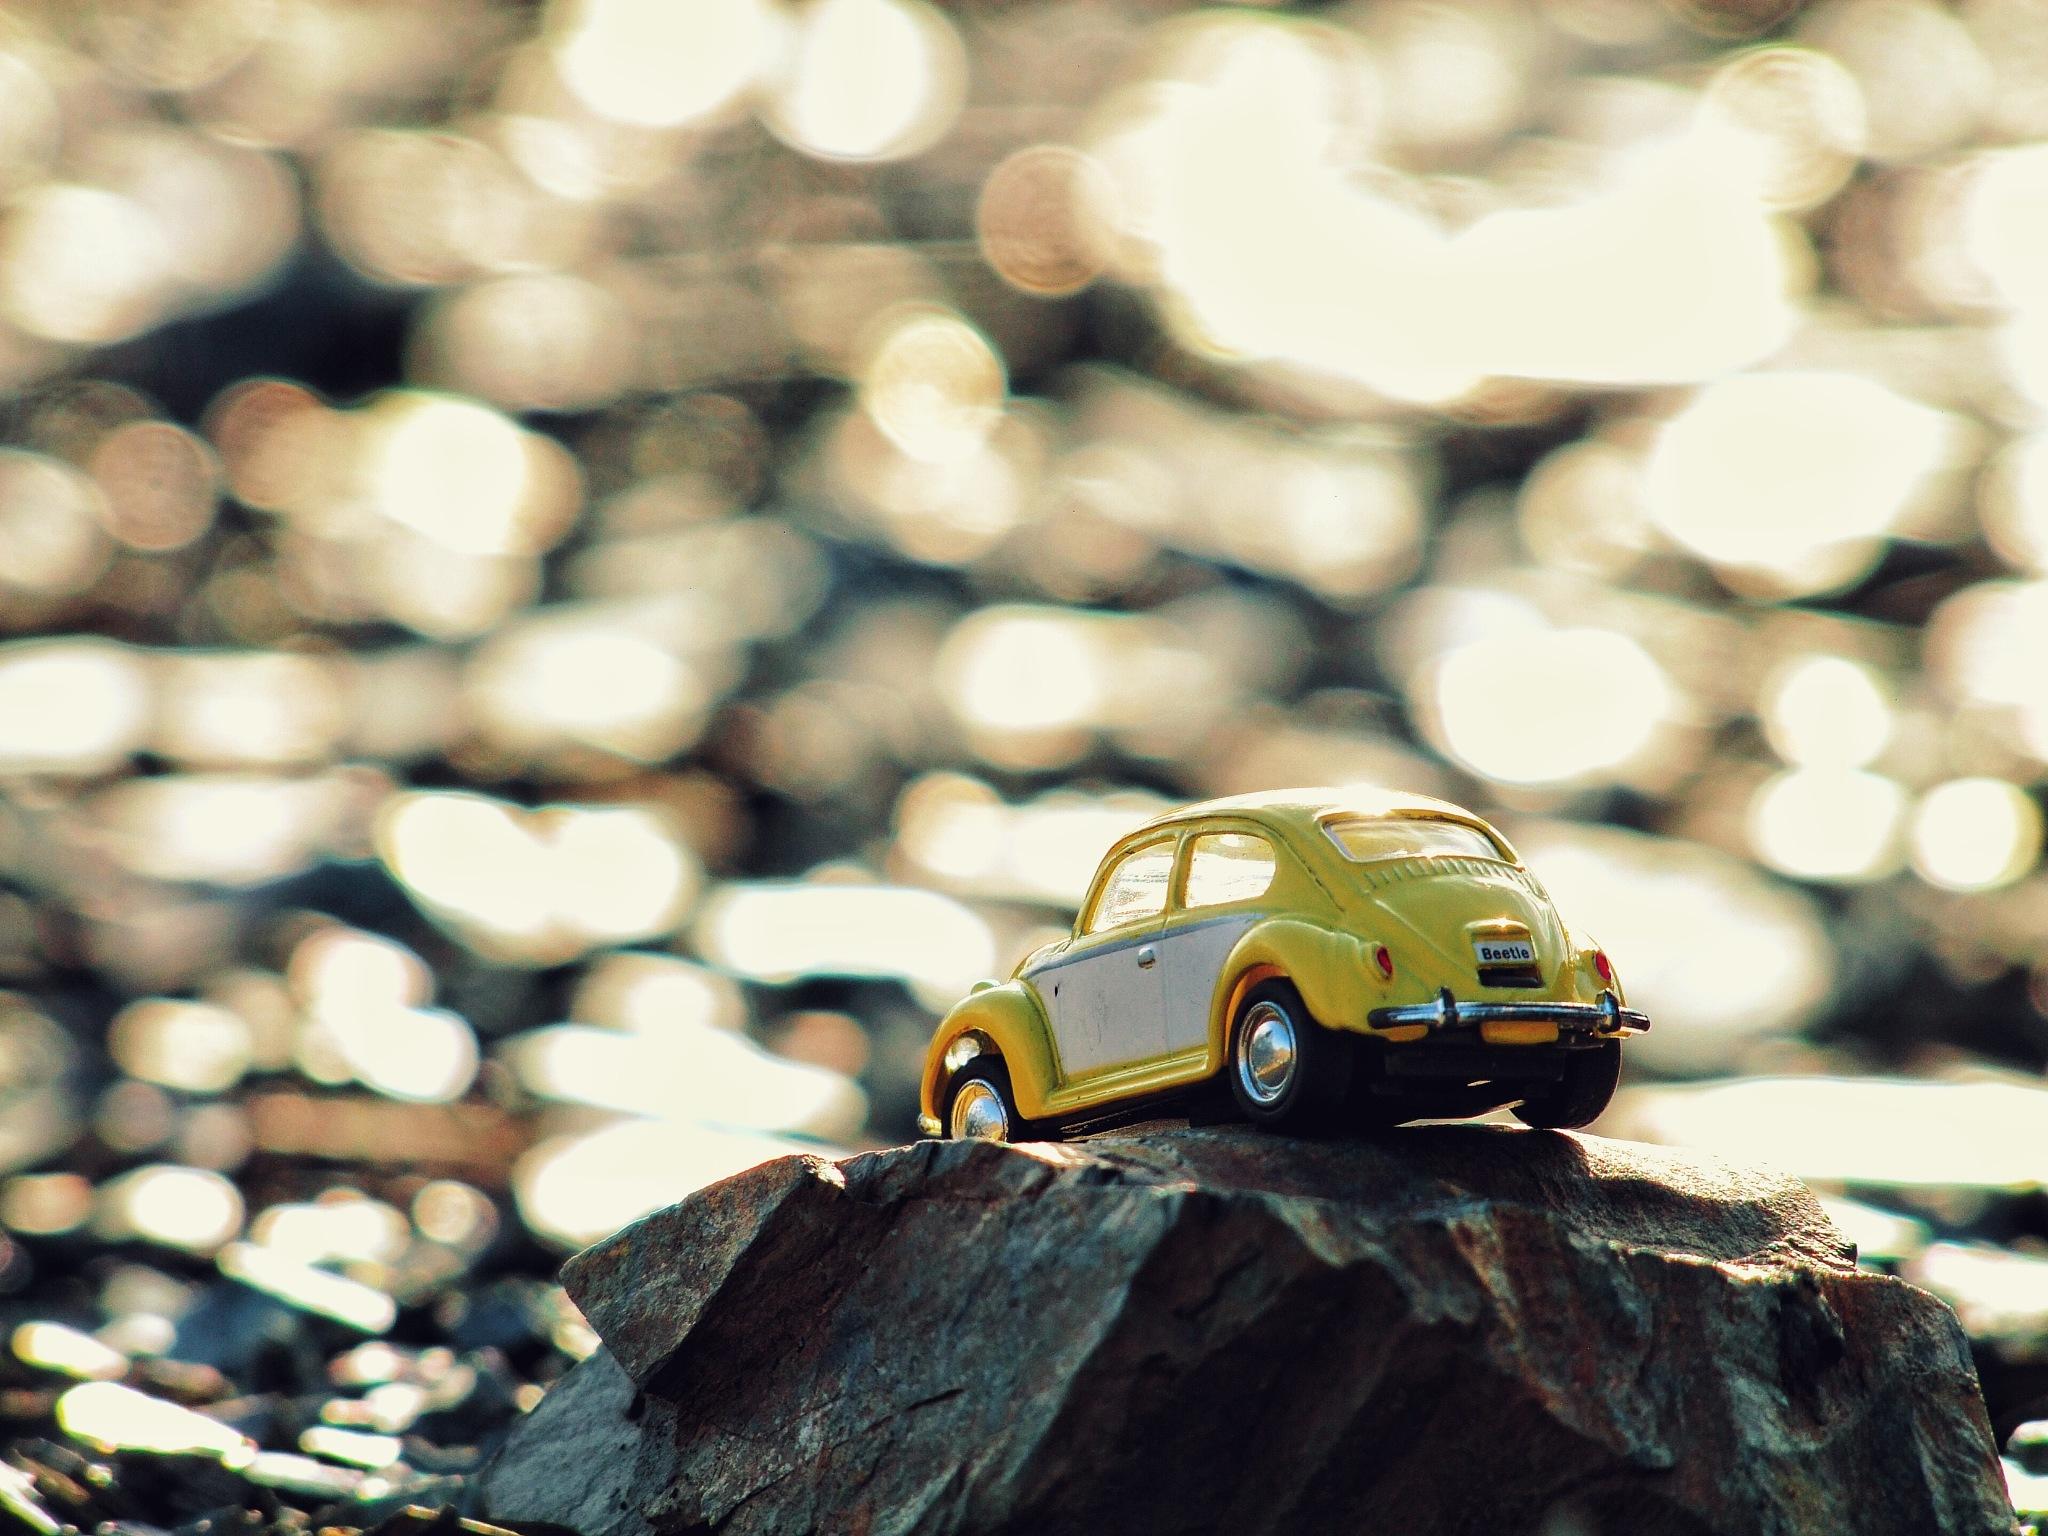 Mr yellow by Nima Nekookar